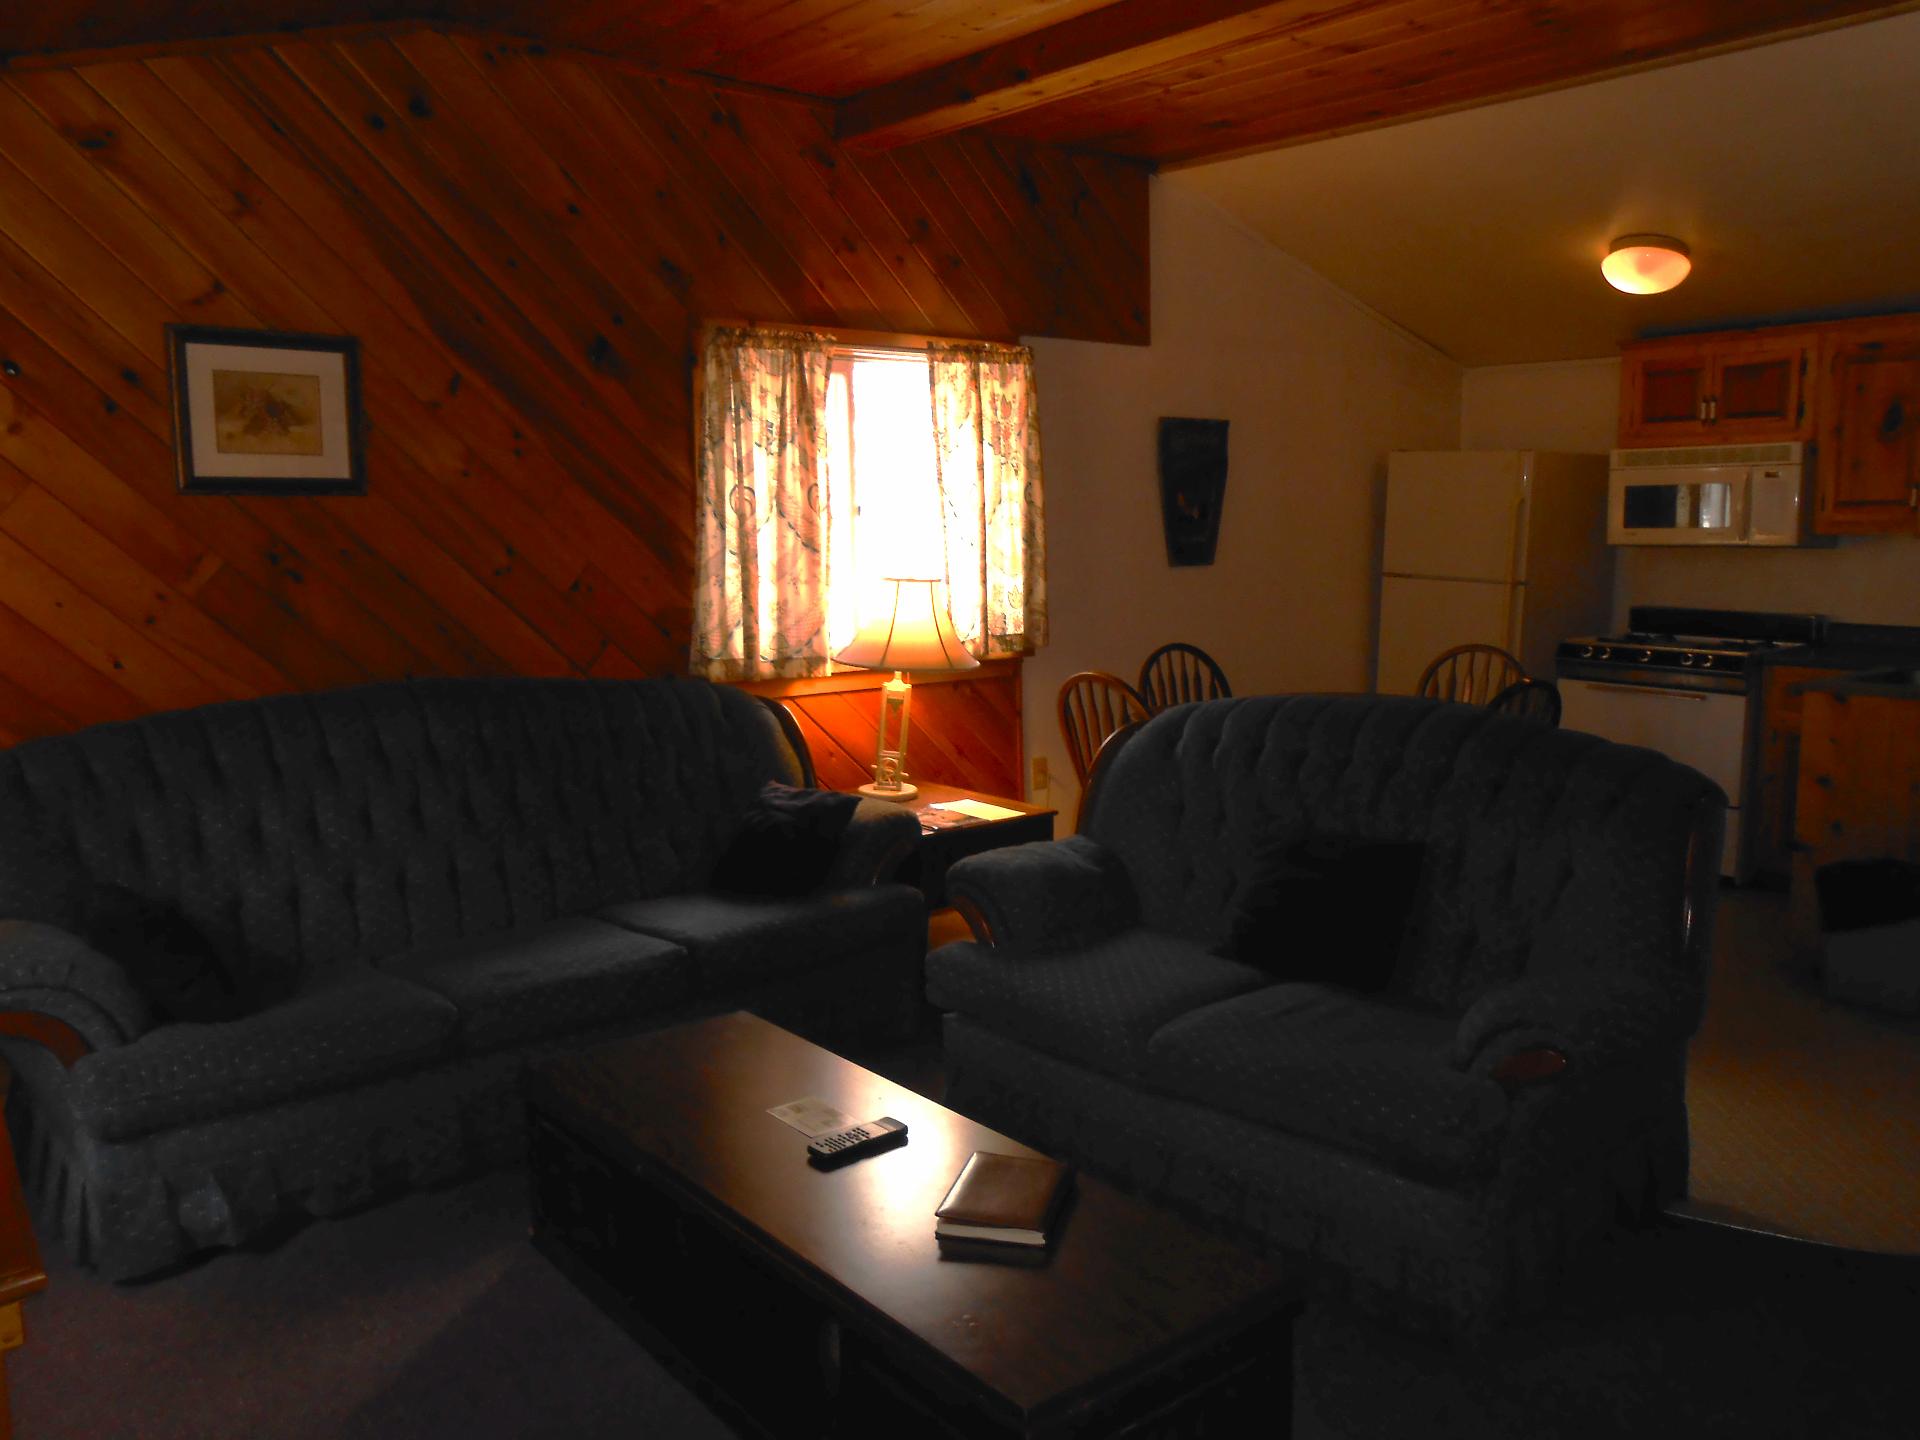 Interior Cabin 4 Two Bedroom Rental